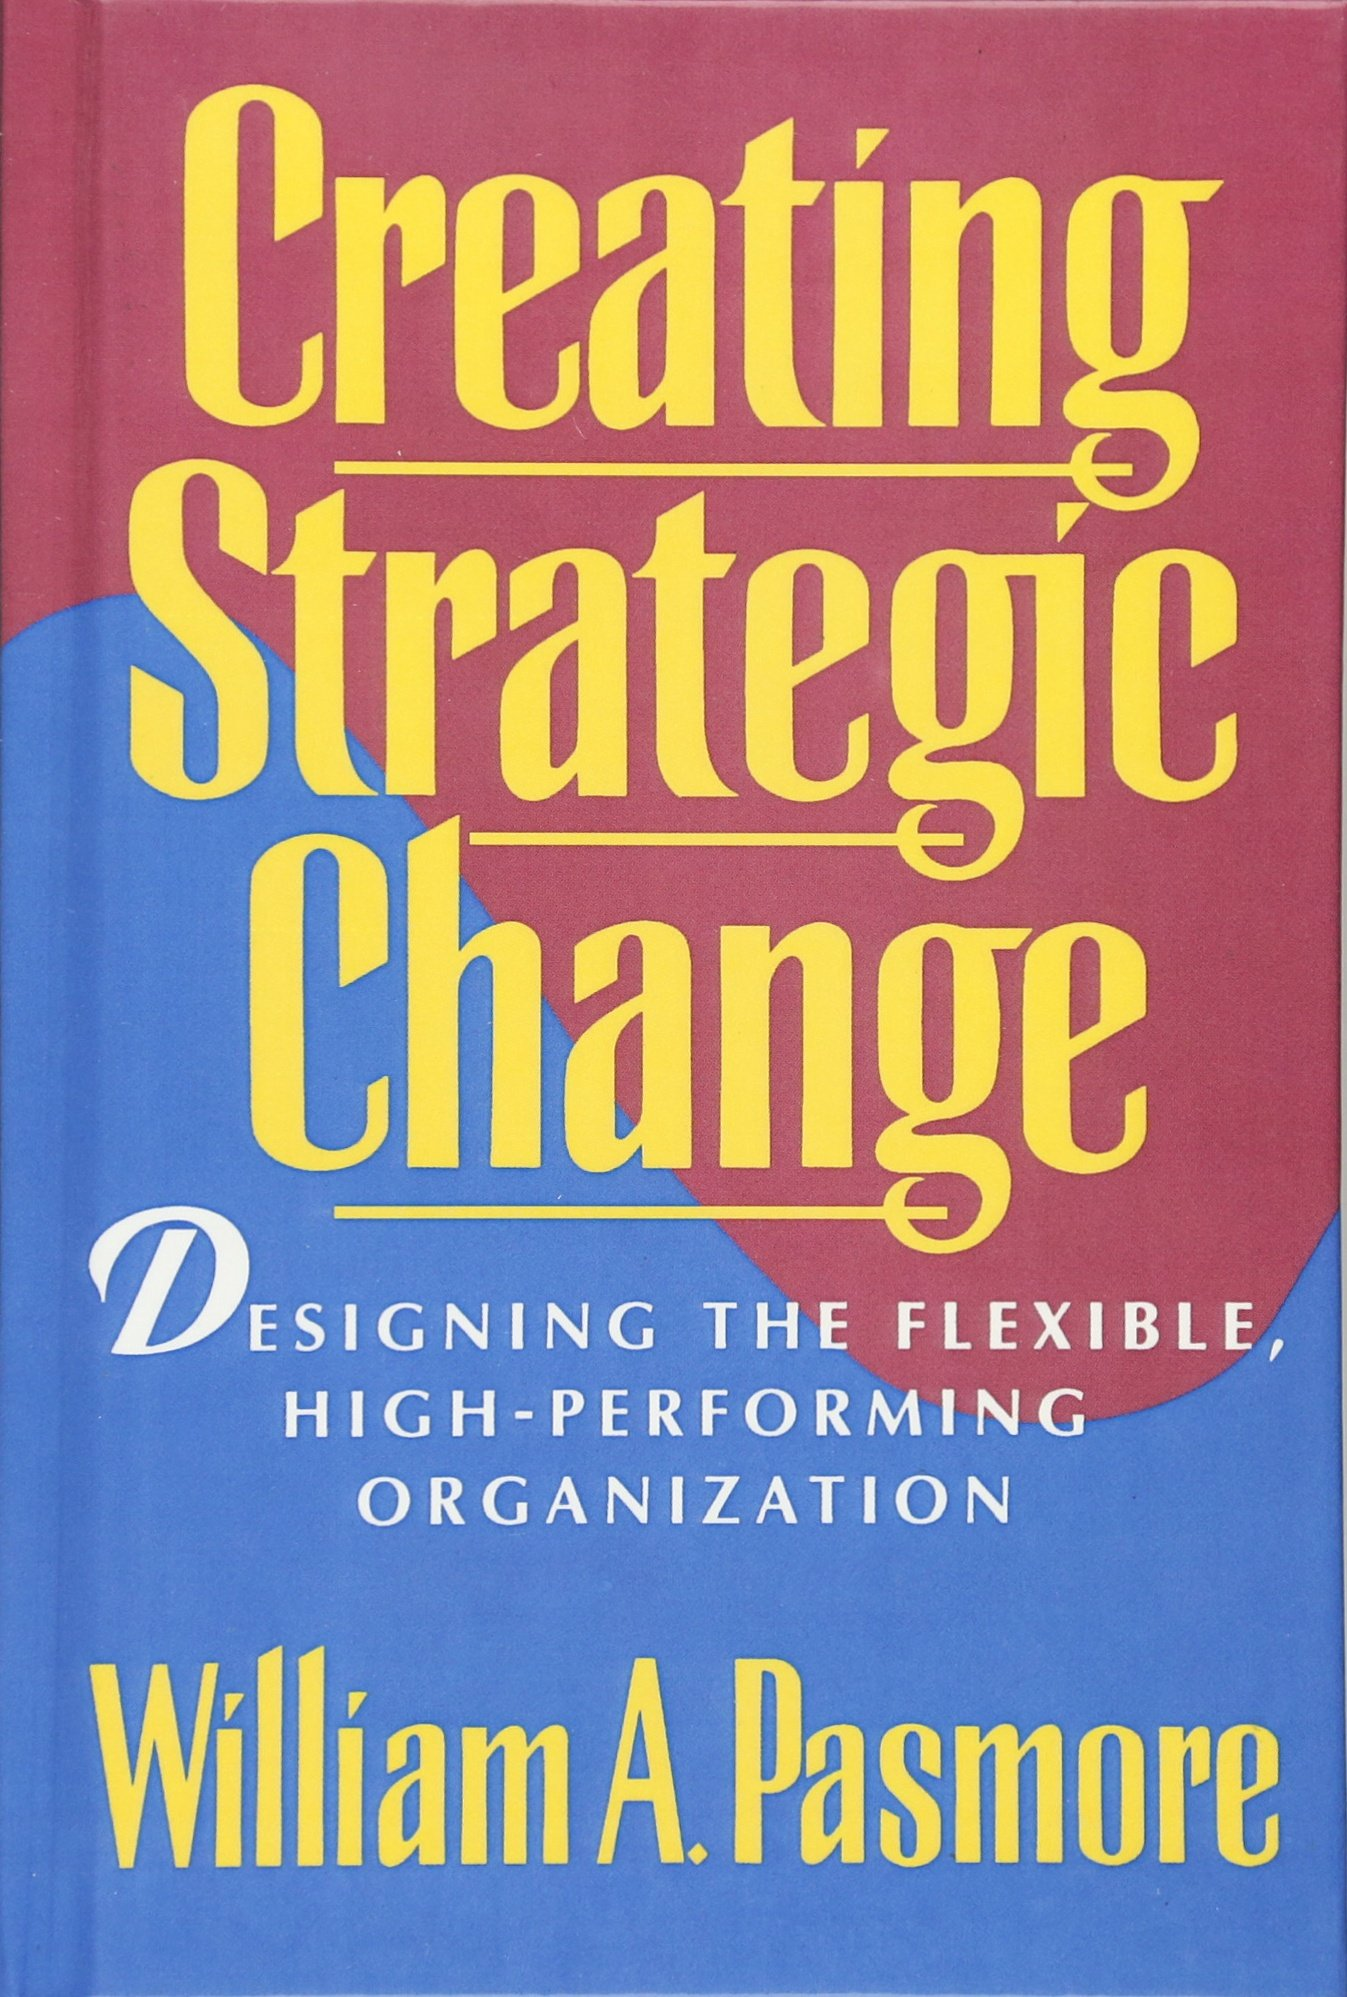 Creating Strategic Change: Designing the Flexible, High-Performing Organization